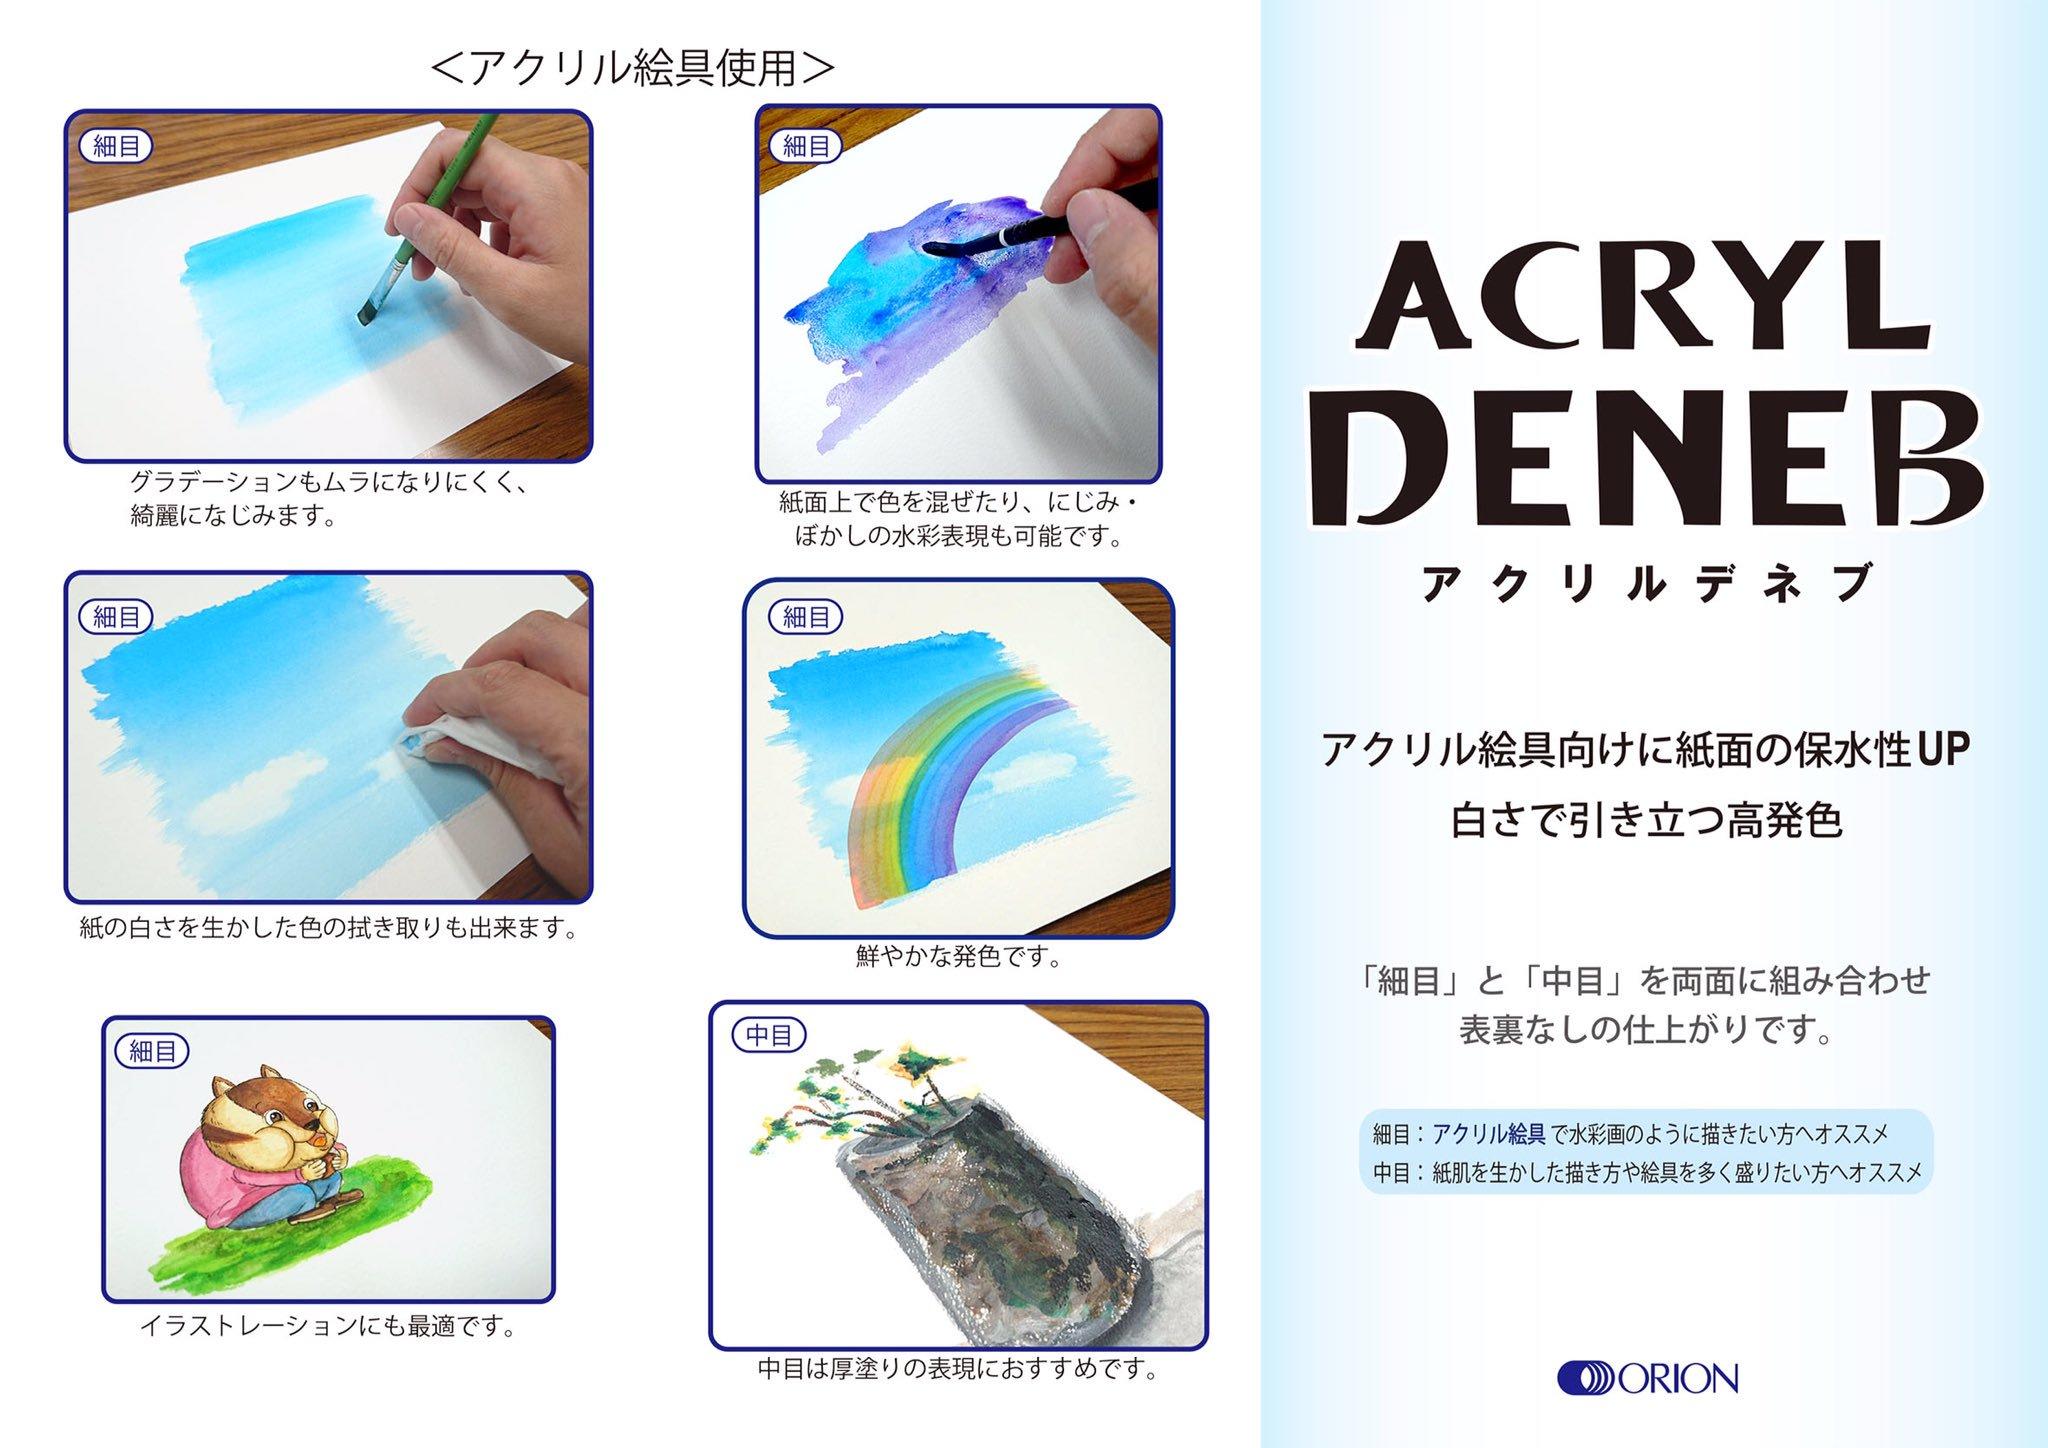 acryldeneb